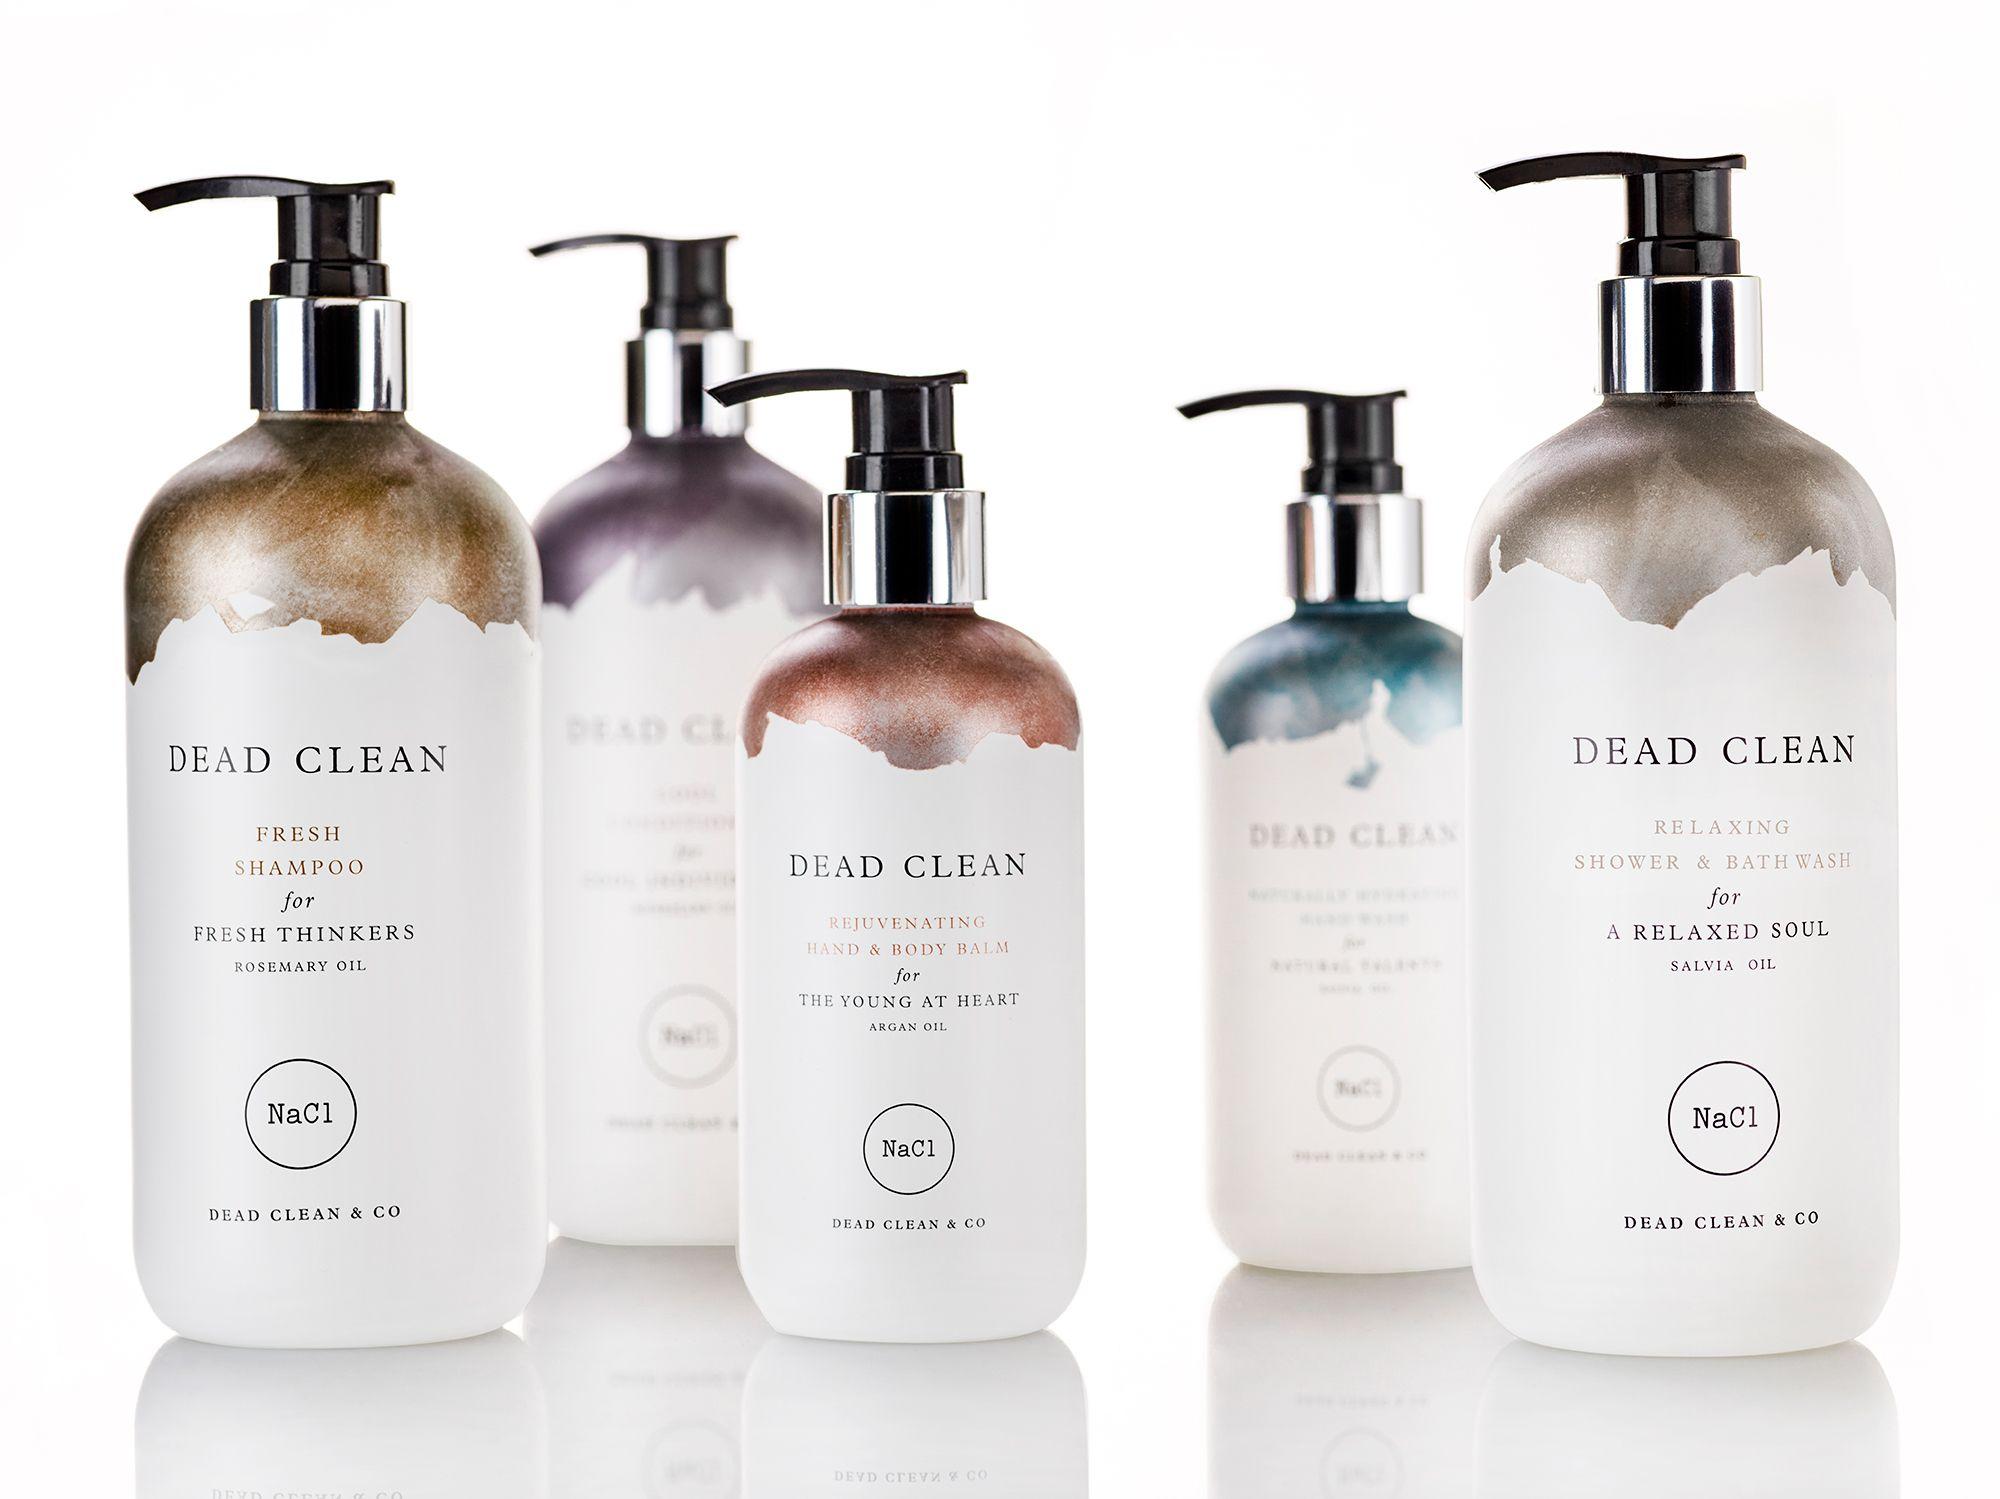 The DEAD CLEAN line Shampoo packaging